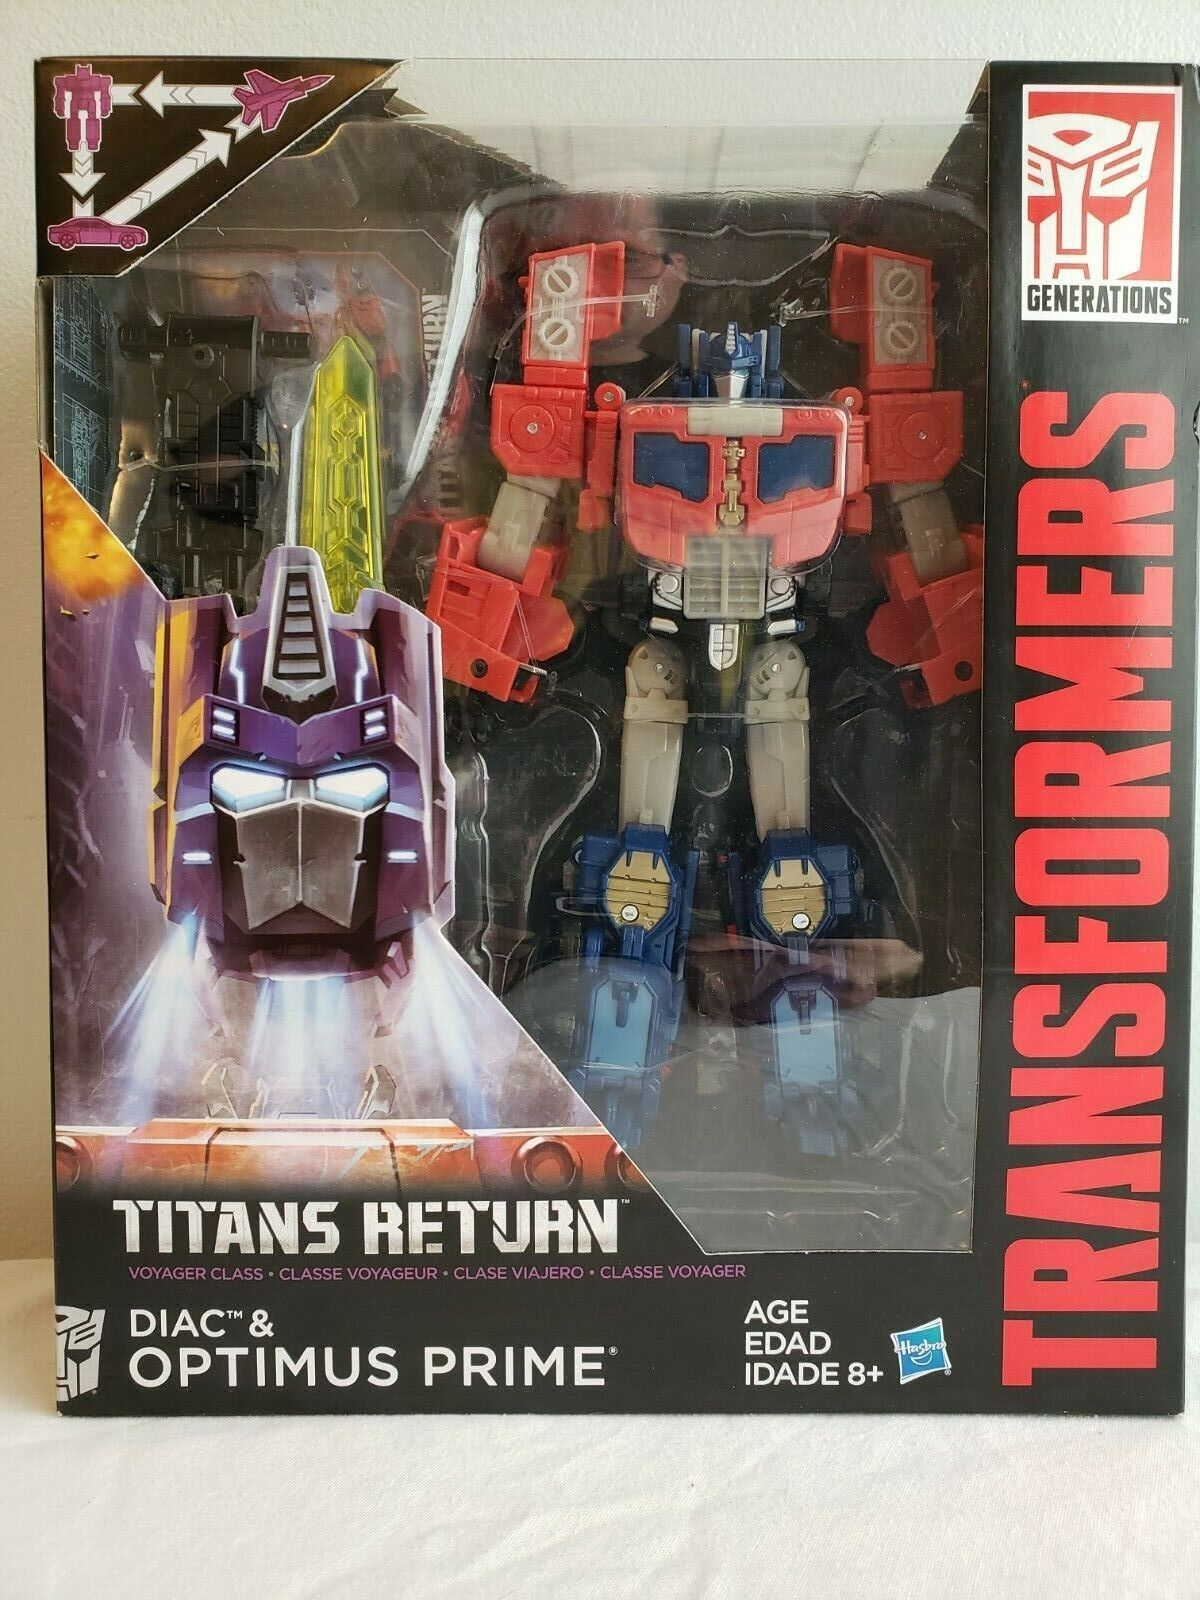 Optimus Prime and Diac NEW  Transformers Titans Return Voyager Class